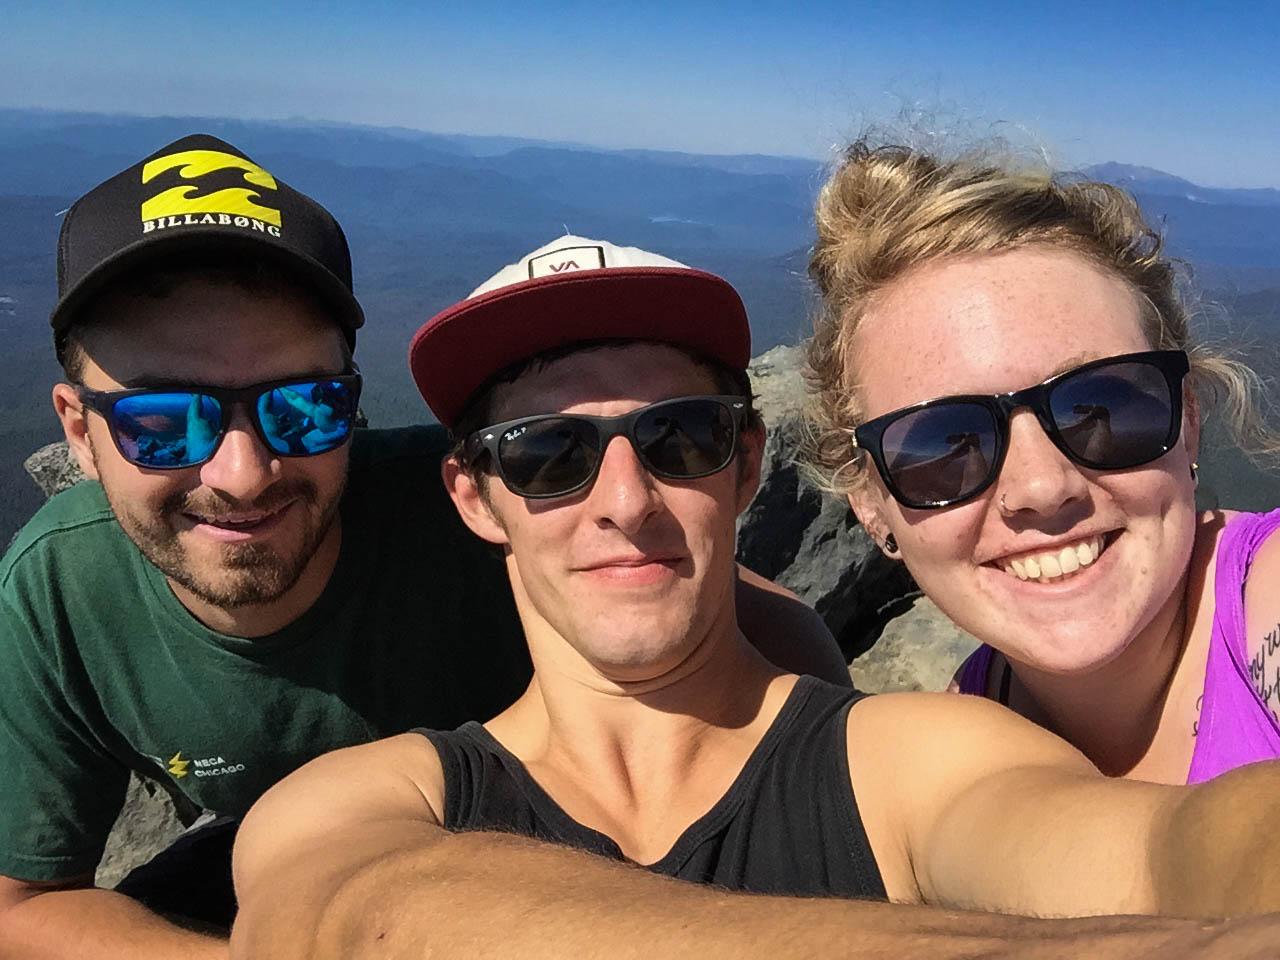 Shameless Summit Selfie!